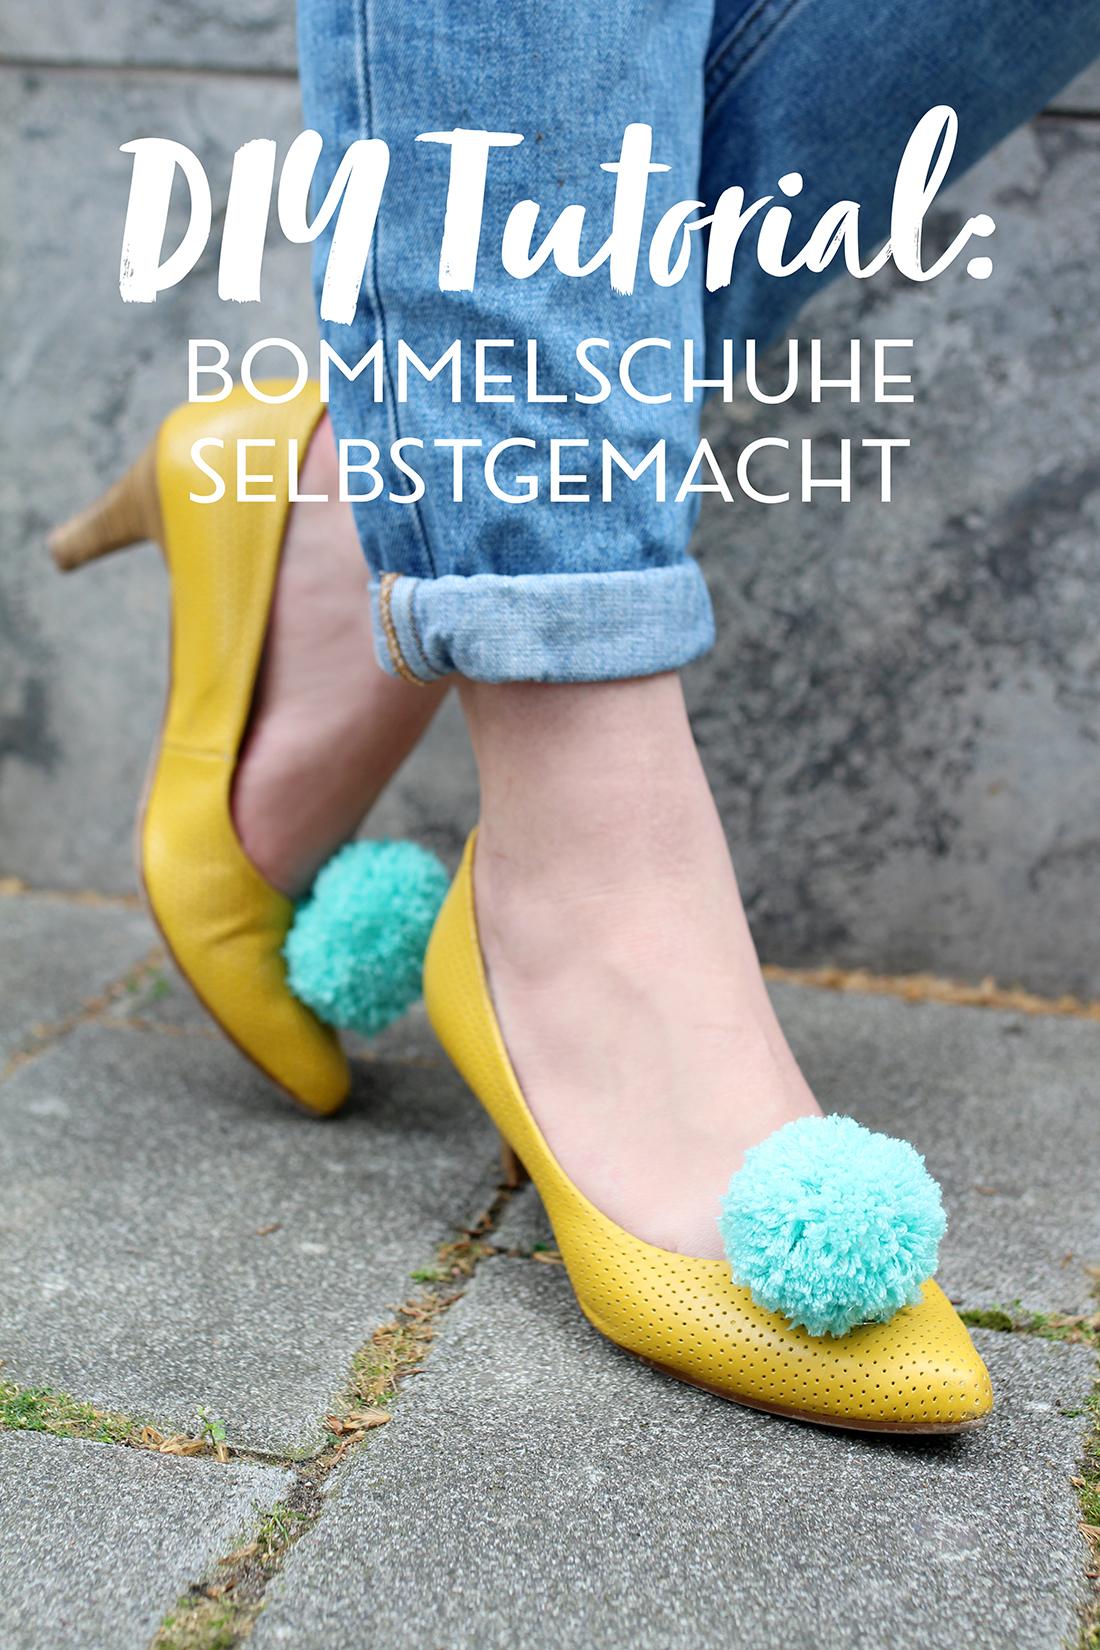 Diy Blog Bommel Schuhe Selbermachen Naehblog Blog Alles Fuer